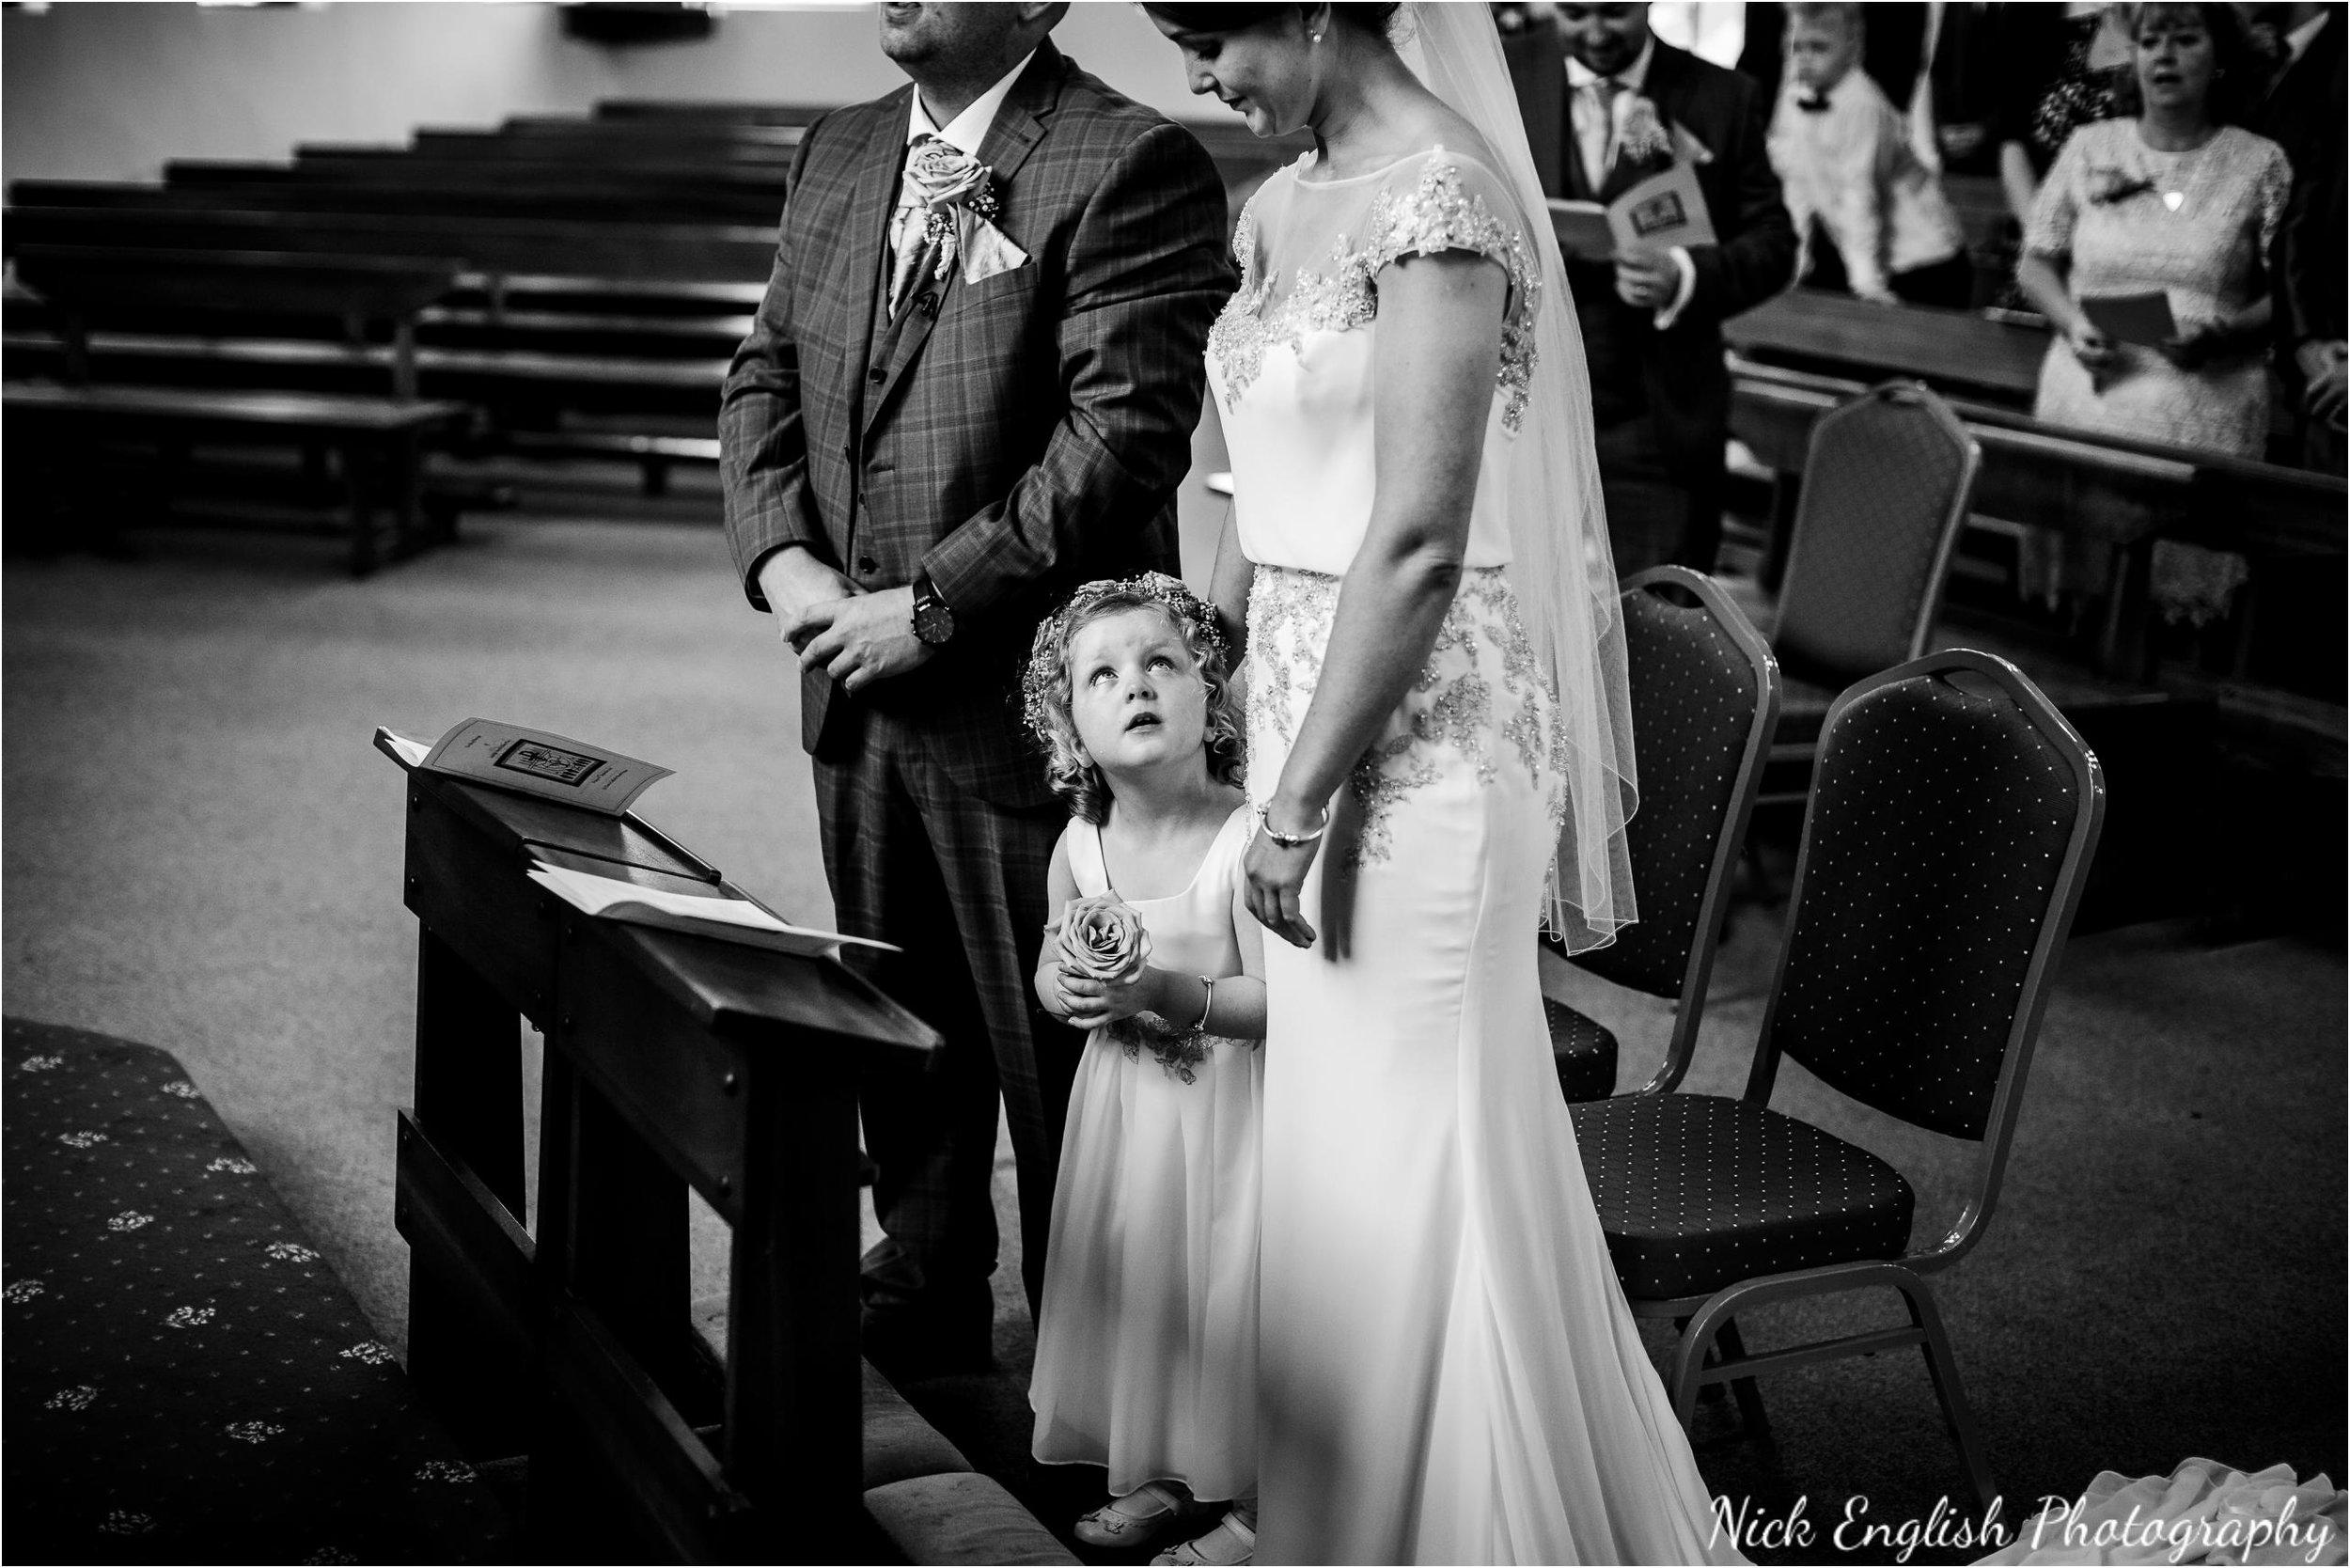 Stacey-Ash-Wedding-Photographs-Stanley-House-Preston-Lancashire-46.jpg